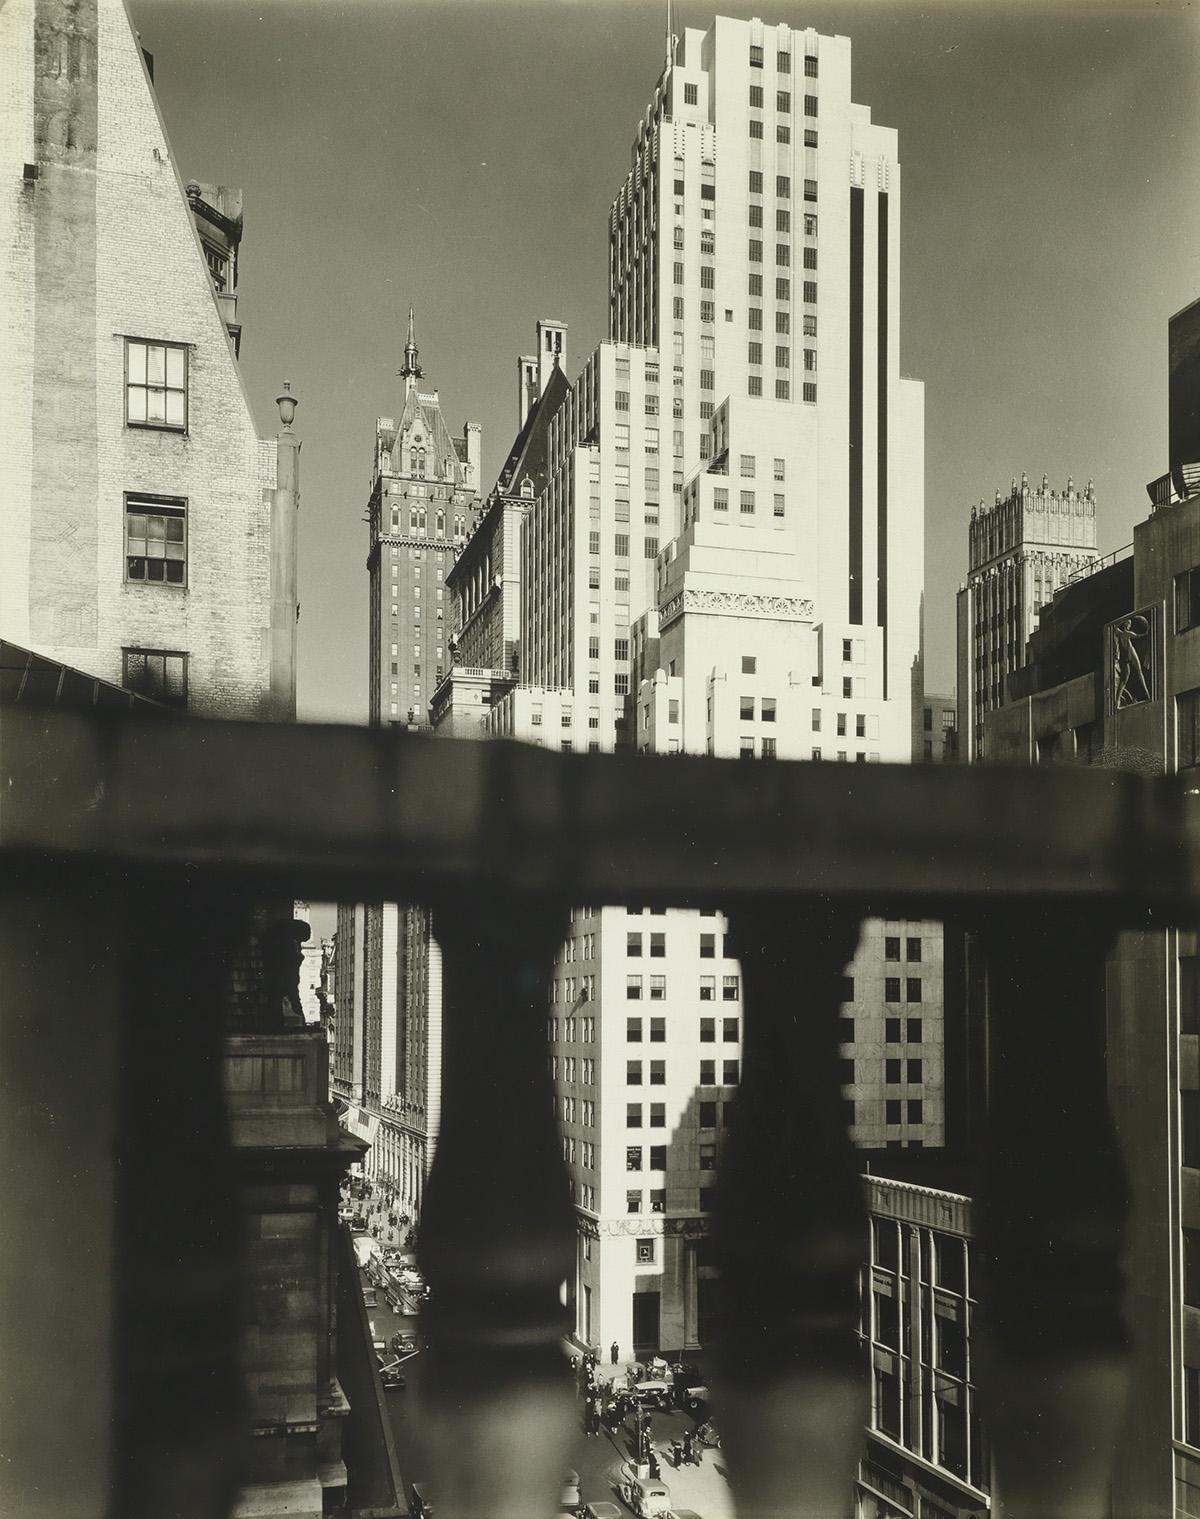 BERENICE-ABBOTT-(1898-1991)-Squibb-Building-with-Sherry-Neth